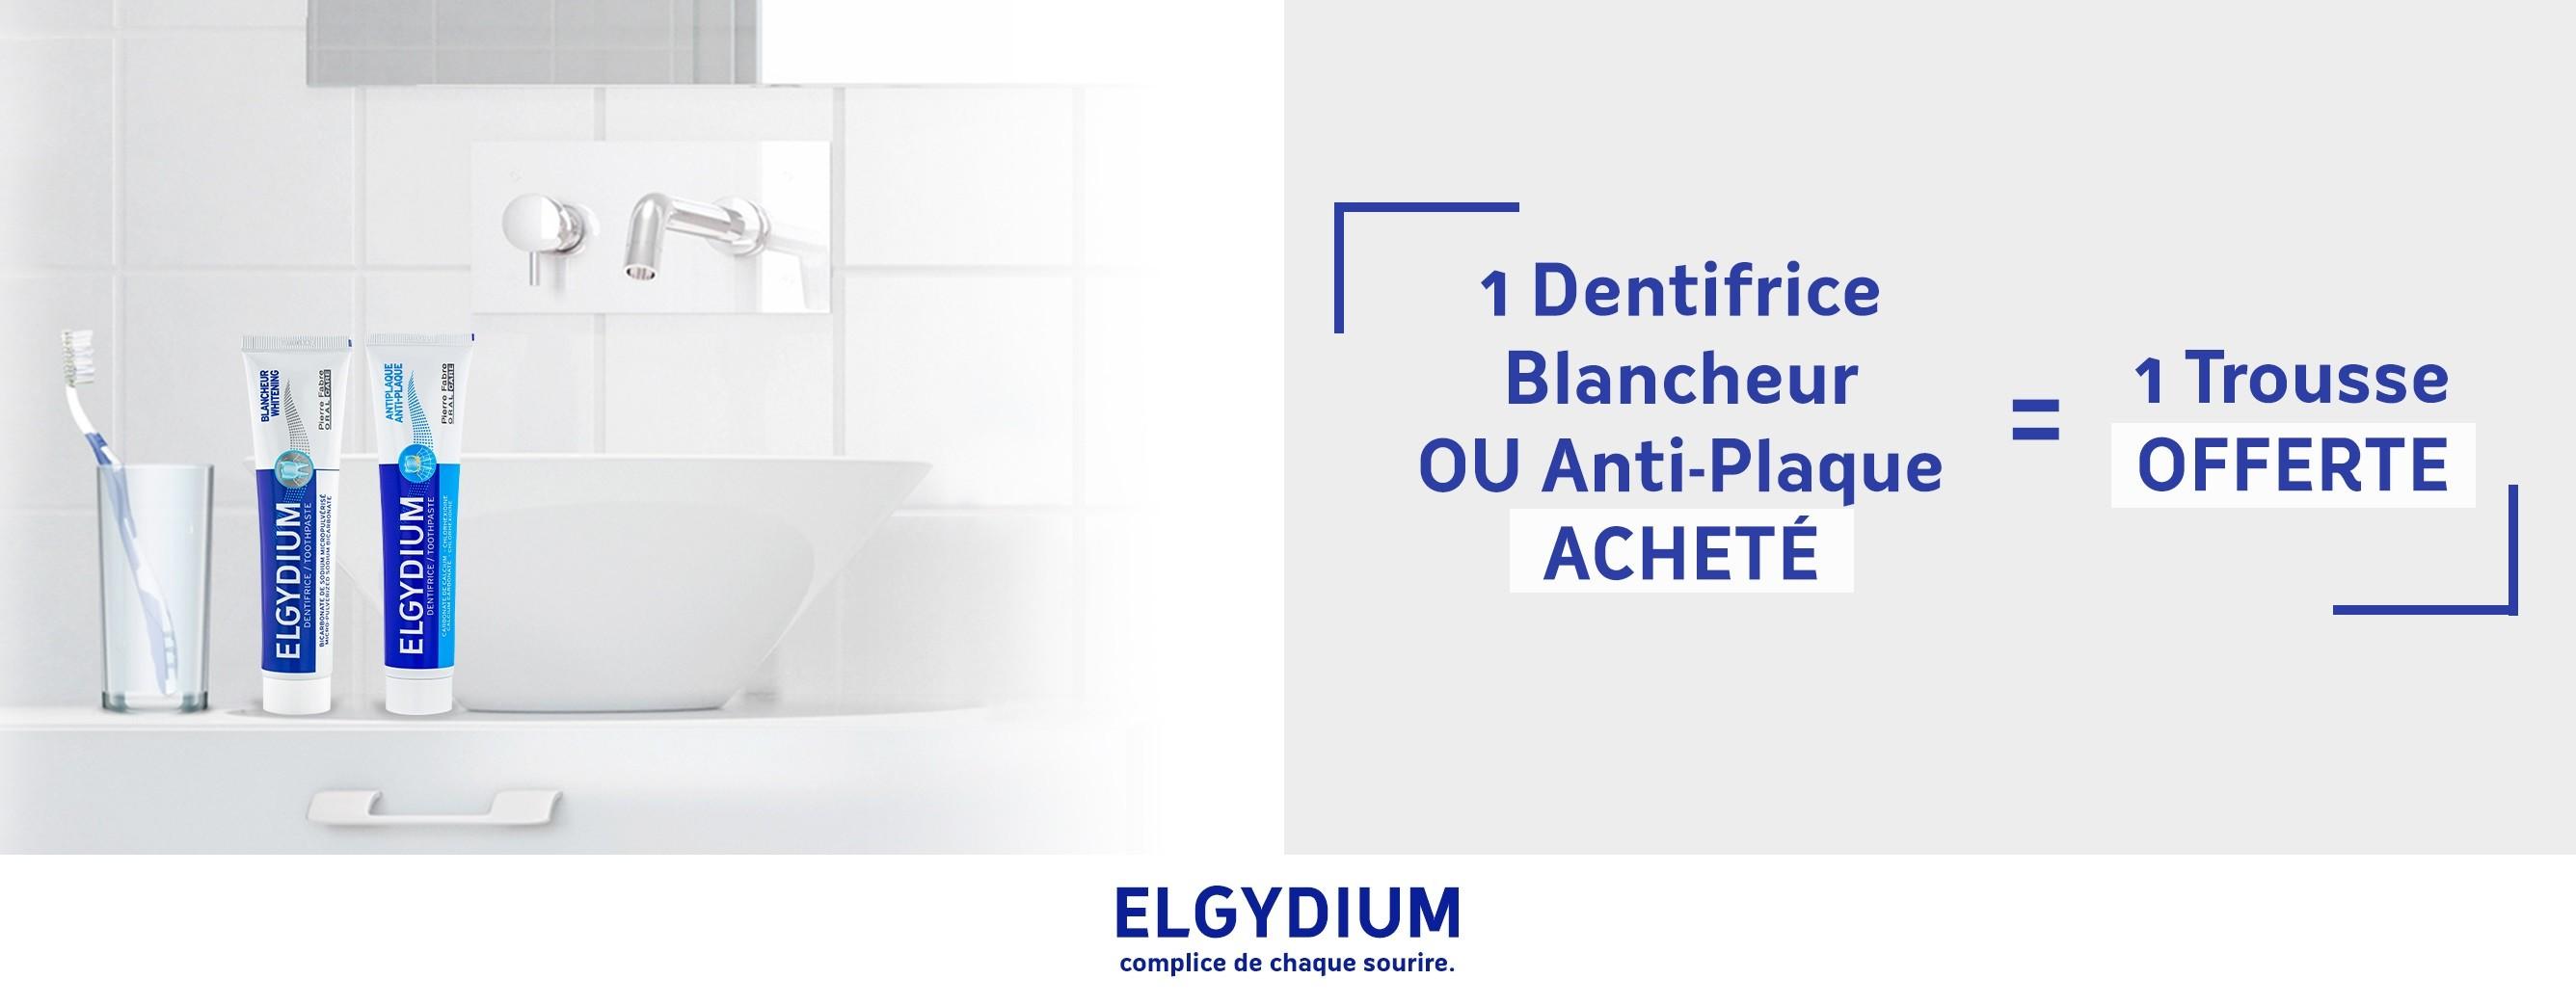 elgedium blancheur